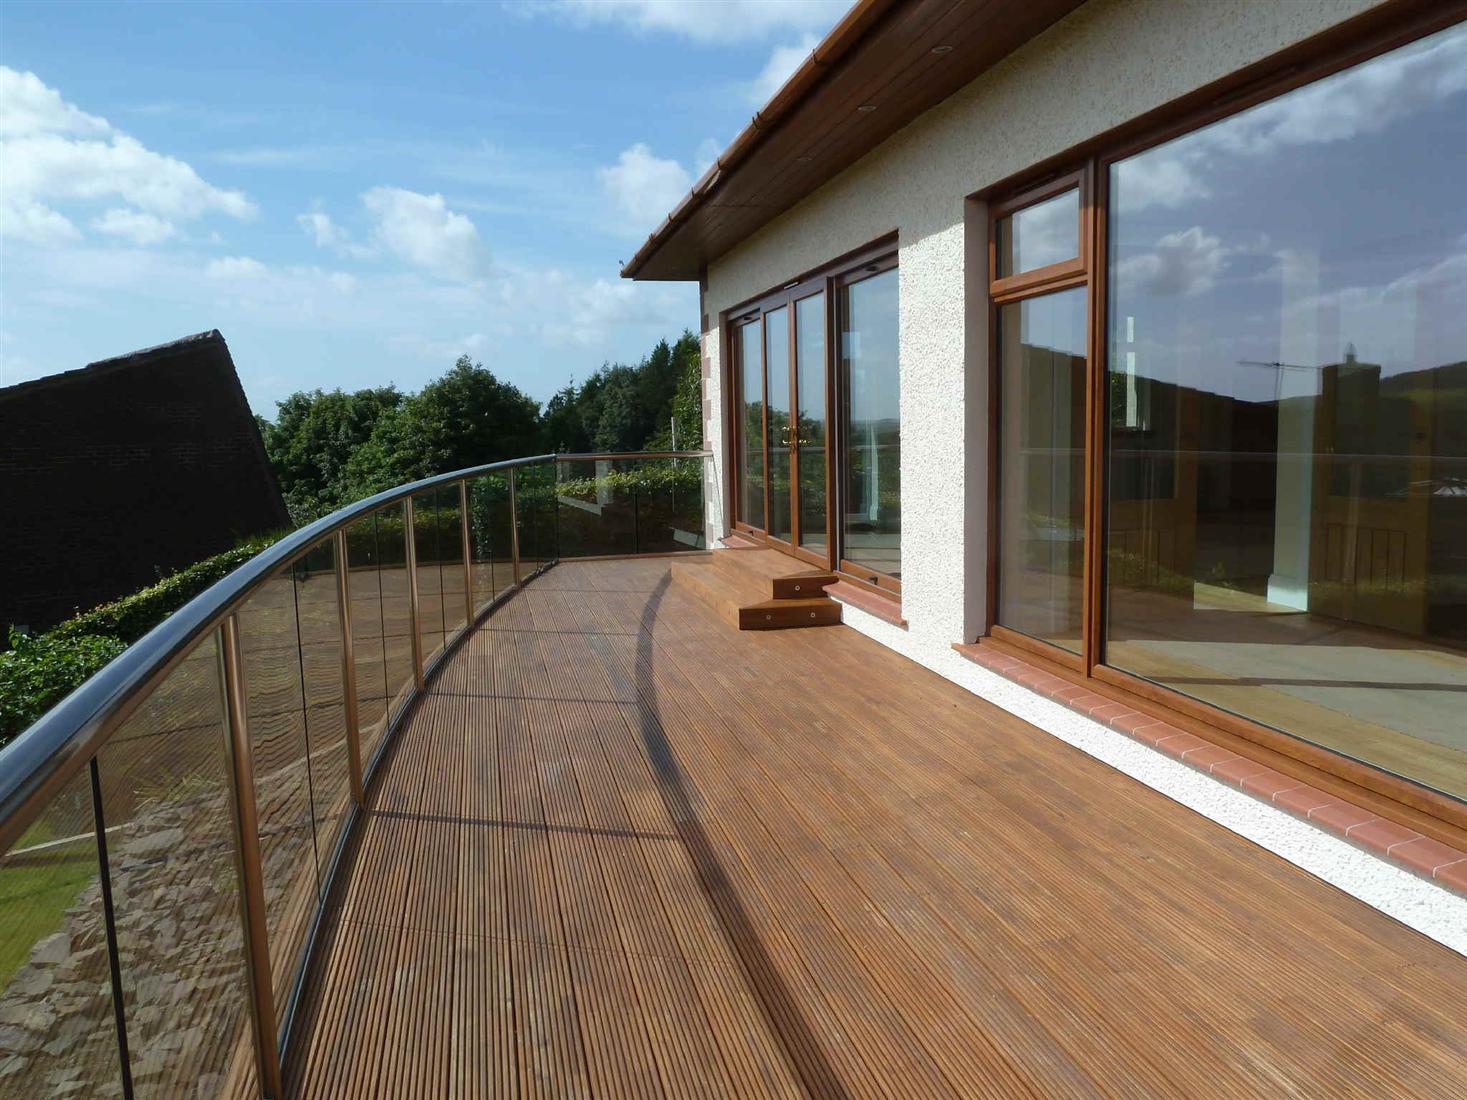 Adding Contemporary Railings Balcony Systems